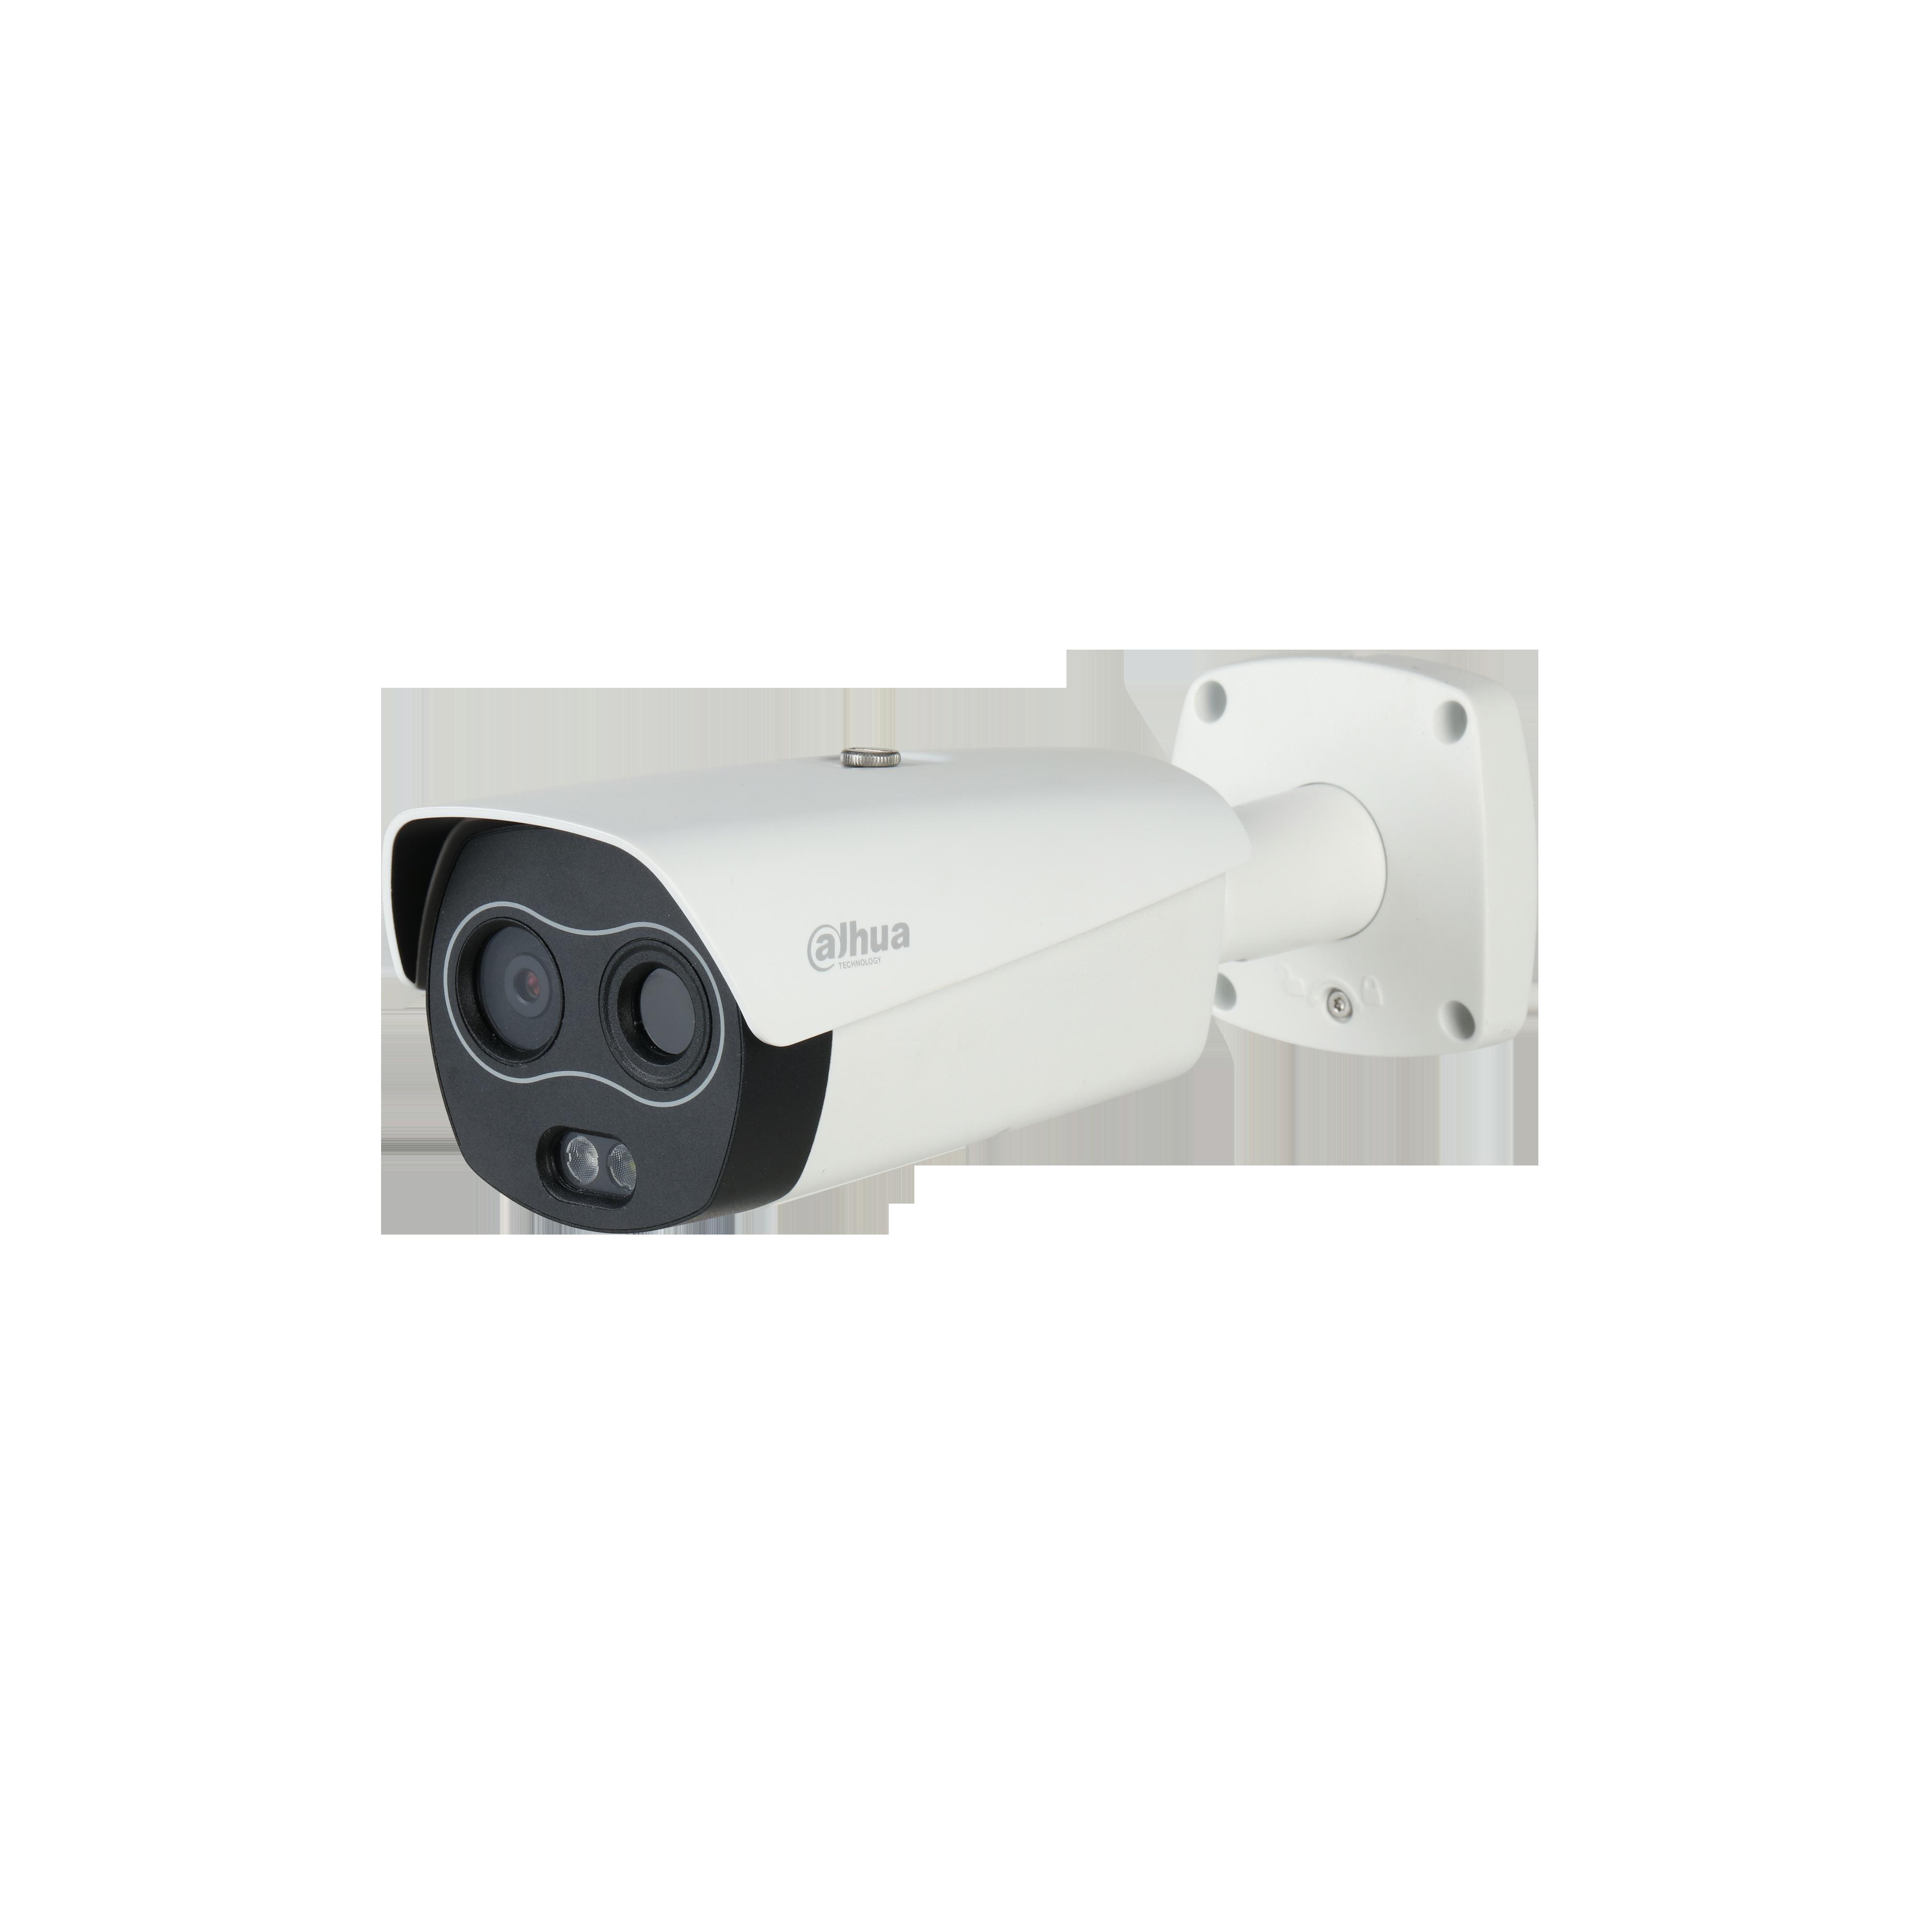 Dahua 256x192 Hybrid Thermal IPC for Body Temperature